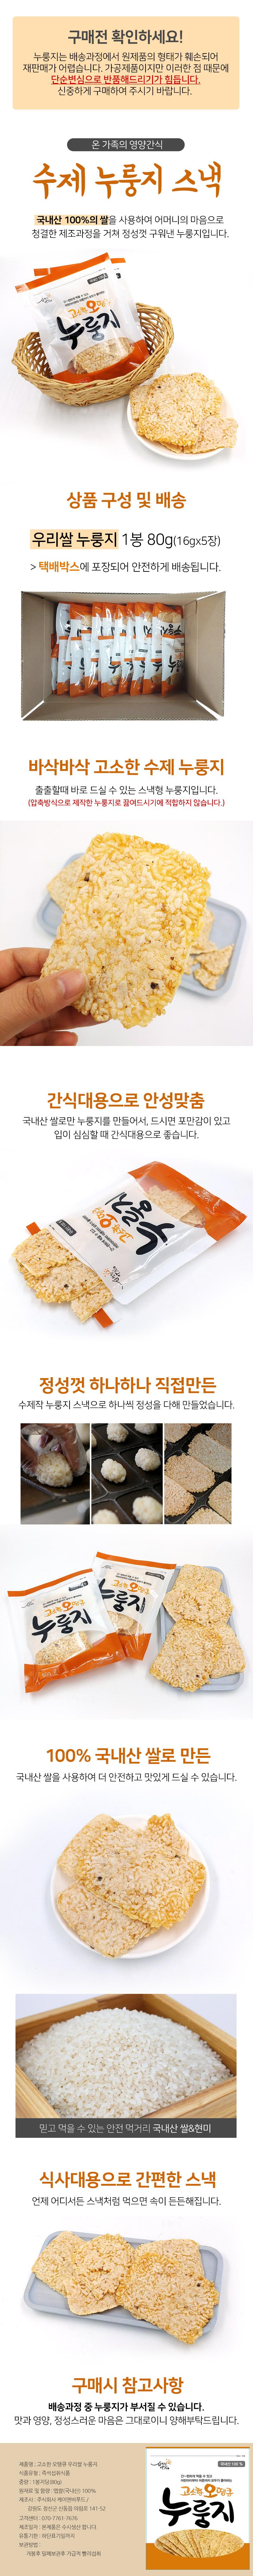 rice_box.jpg